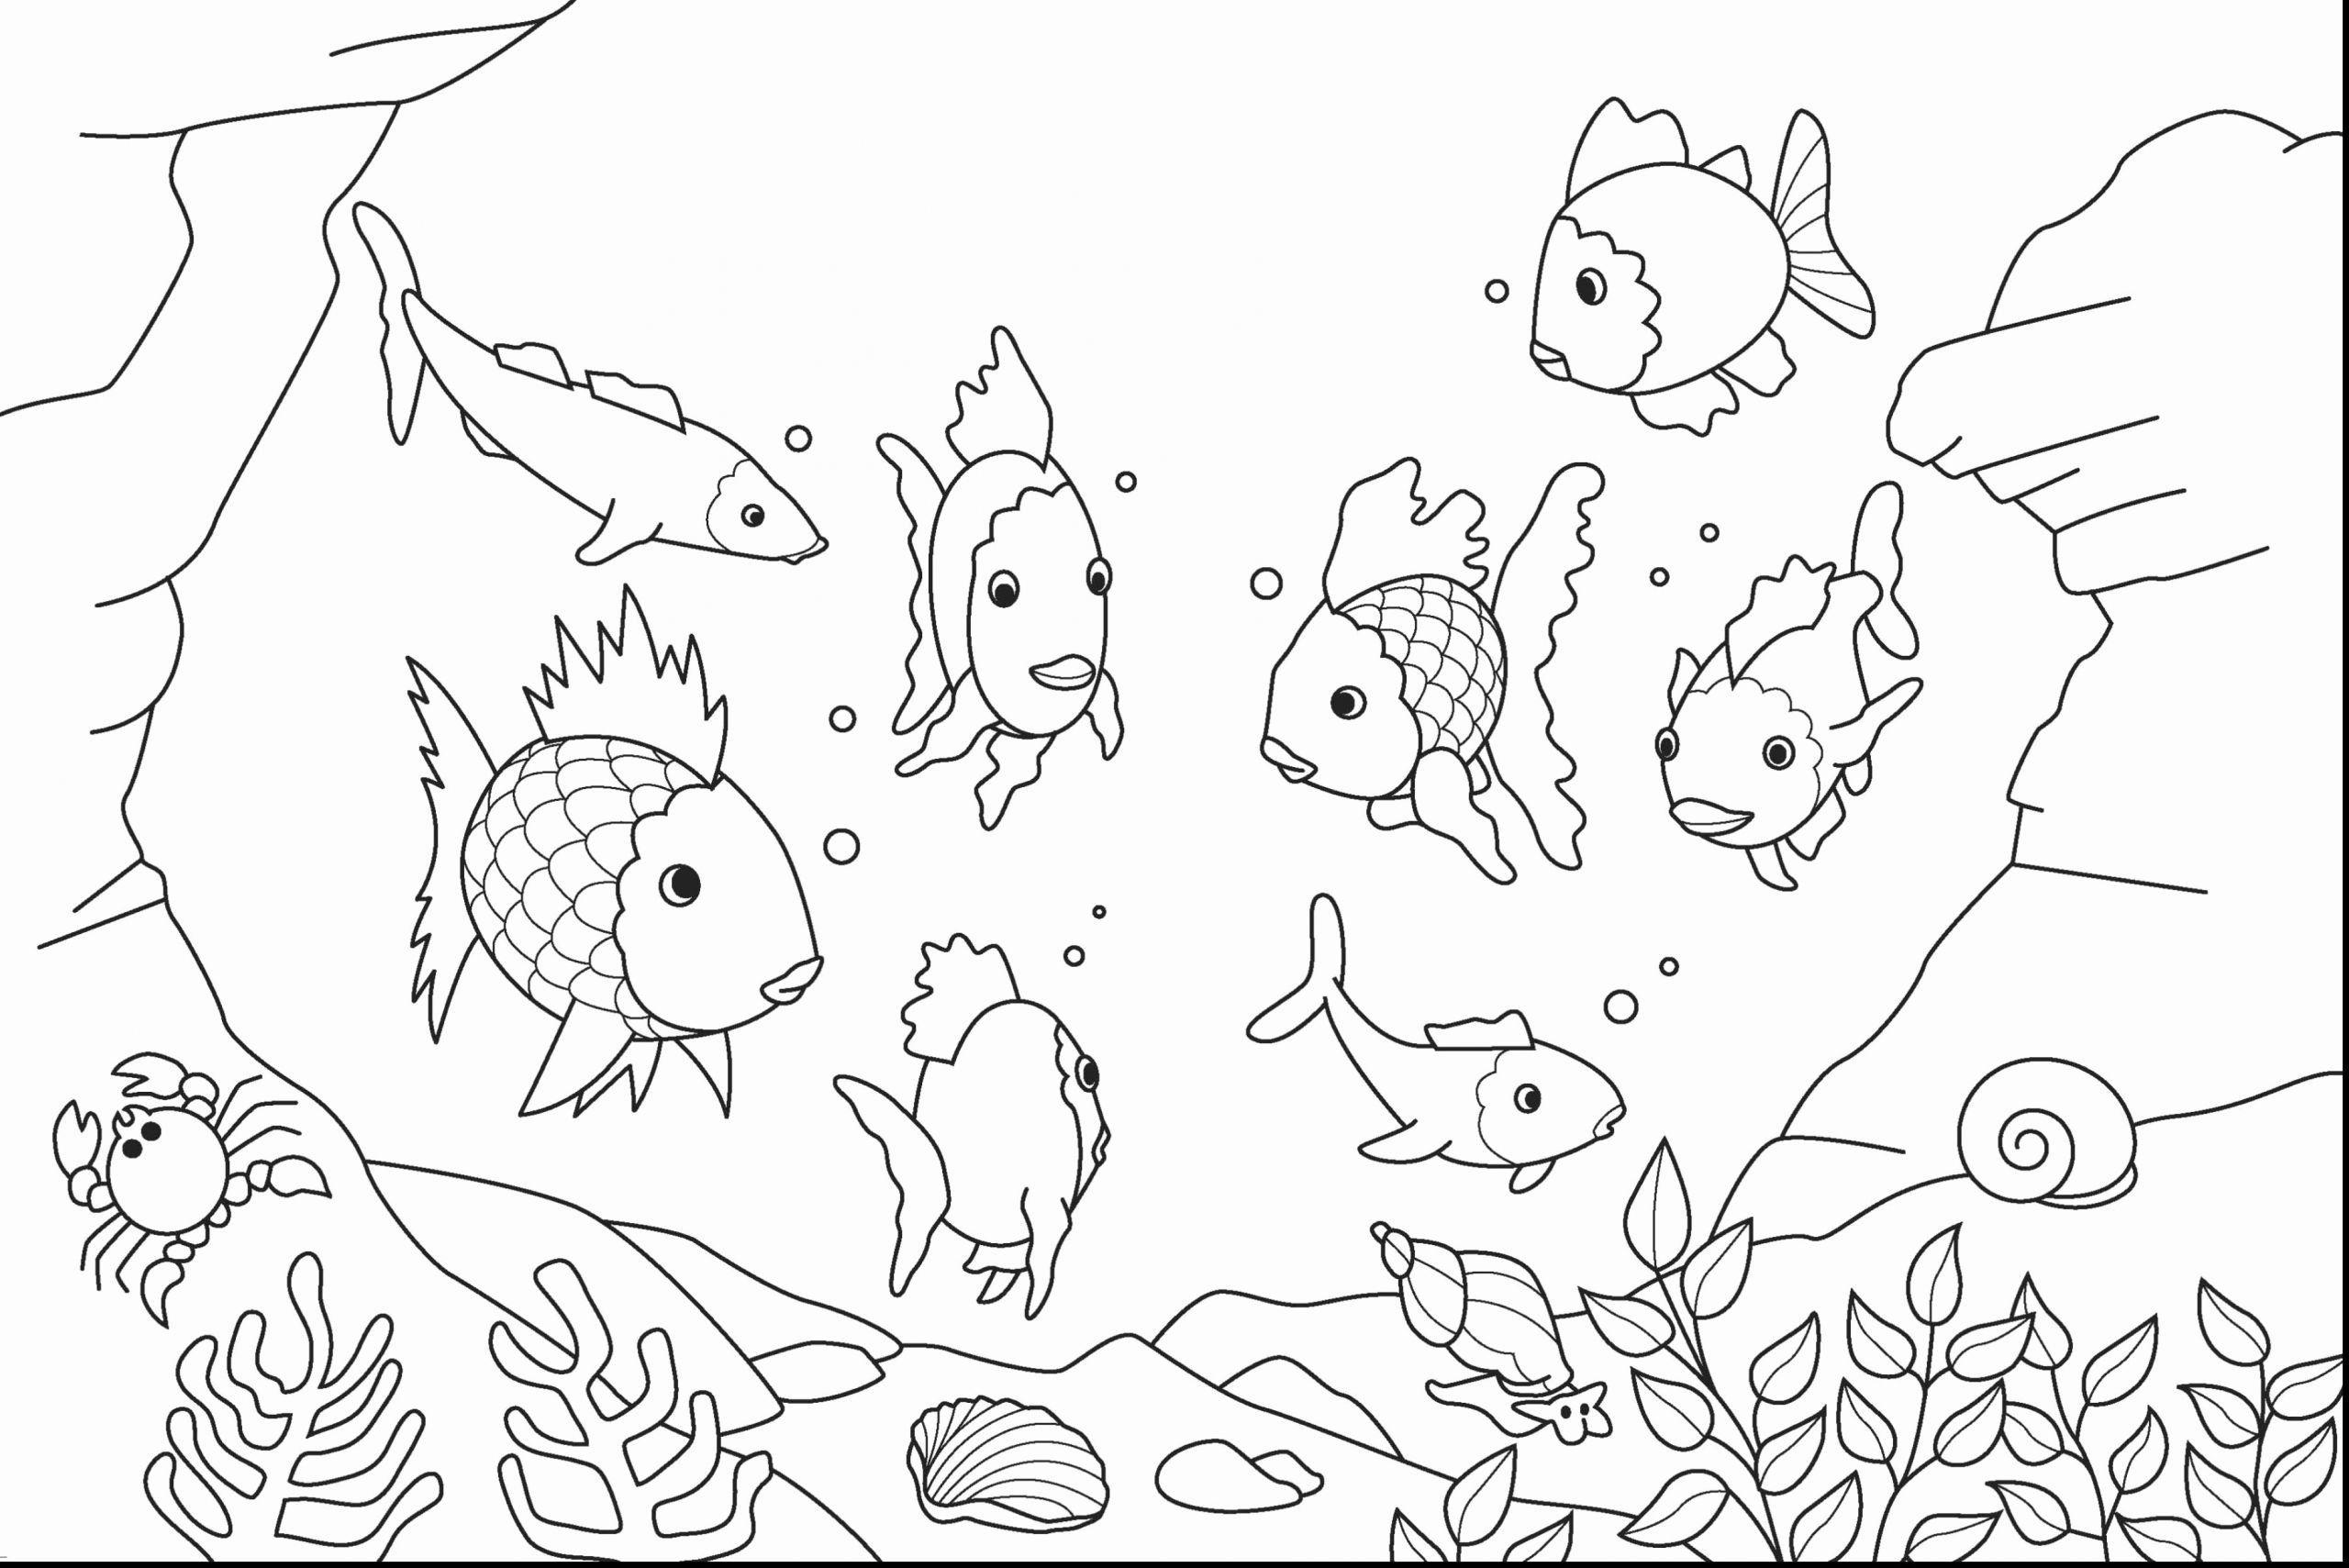 Sea Animals Coloring Page Luxury Under The Sea Fish Coloring Pages In 2020 Fish Coloring Page Animal Coloring Pages Unicorn Coloring Pages